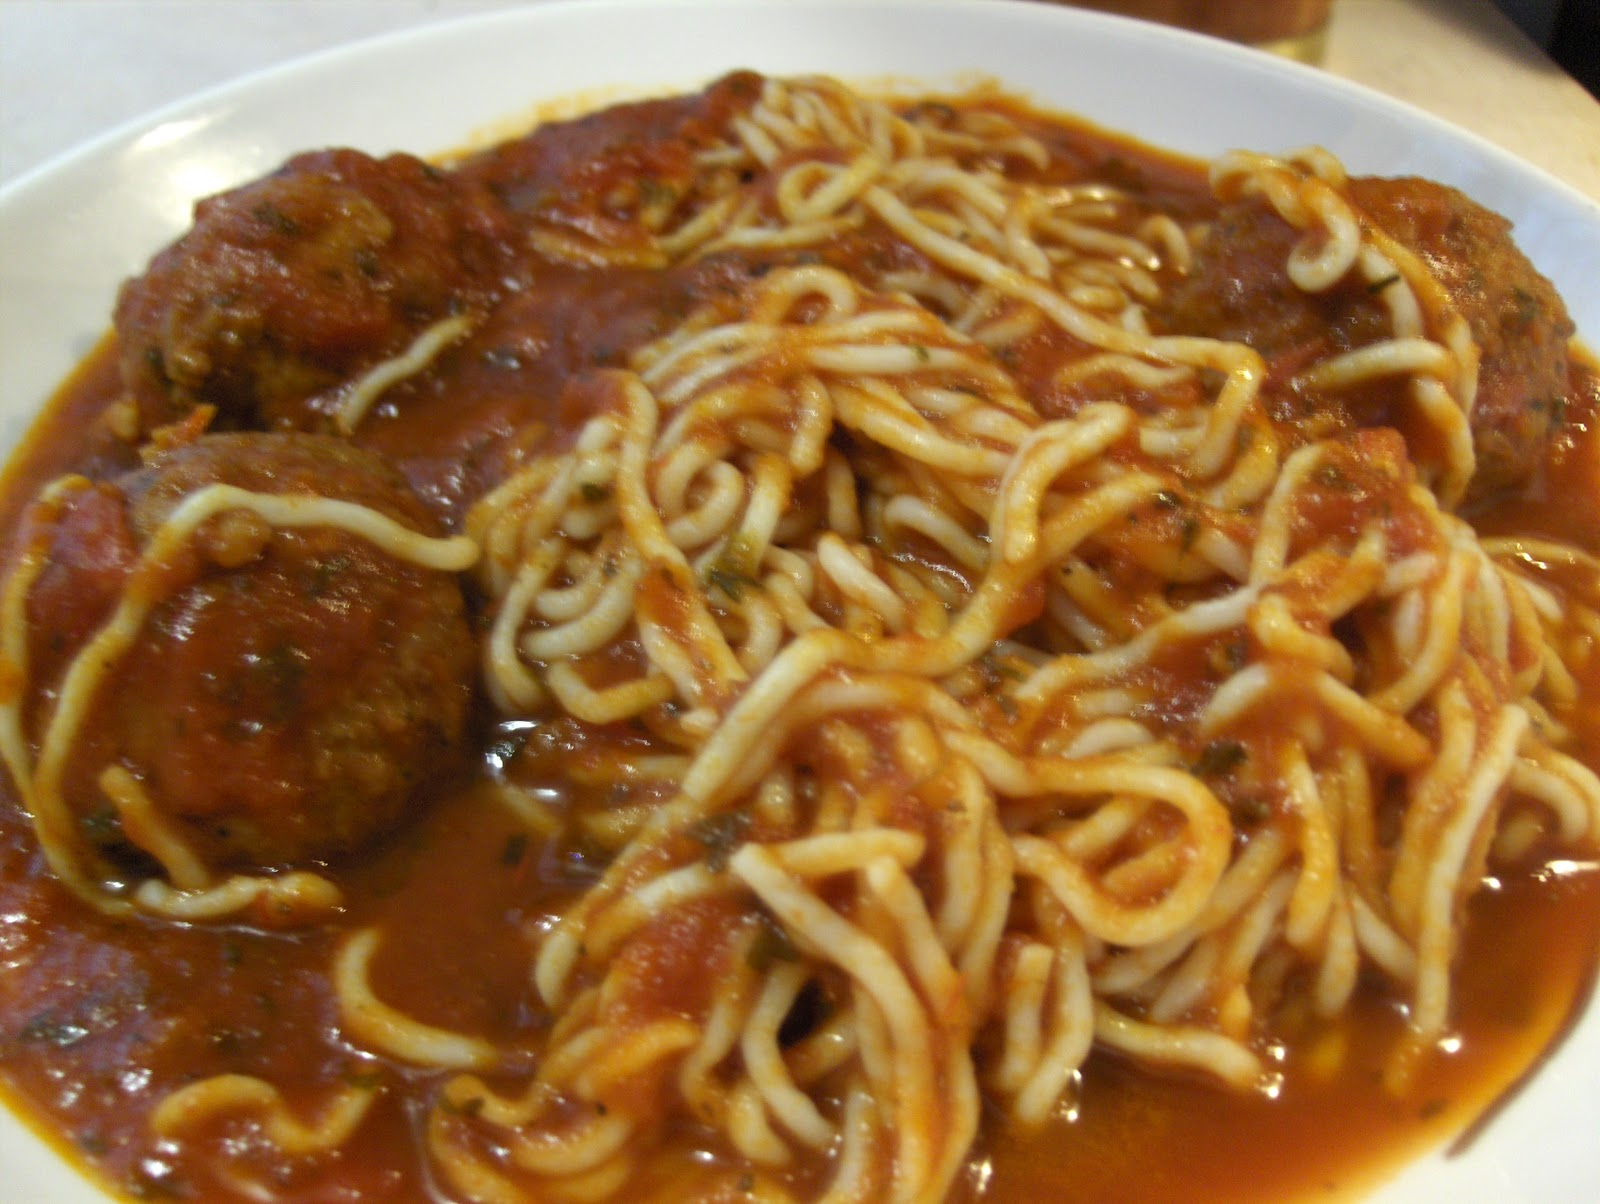 Today's Menu: Tofu Spaghetti and Turkey Meatballs